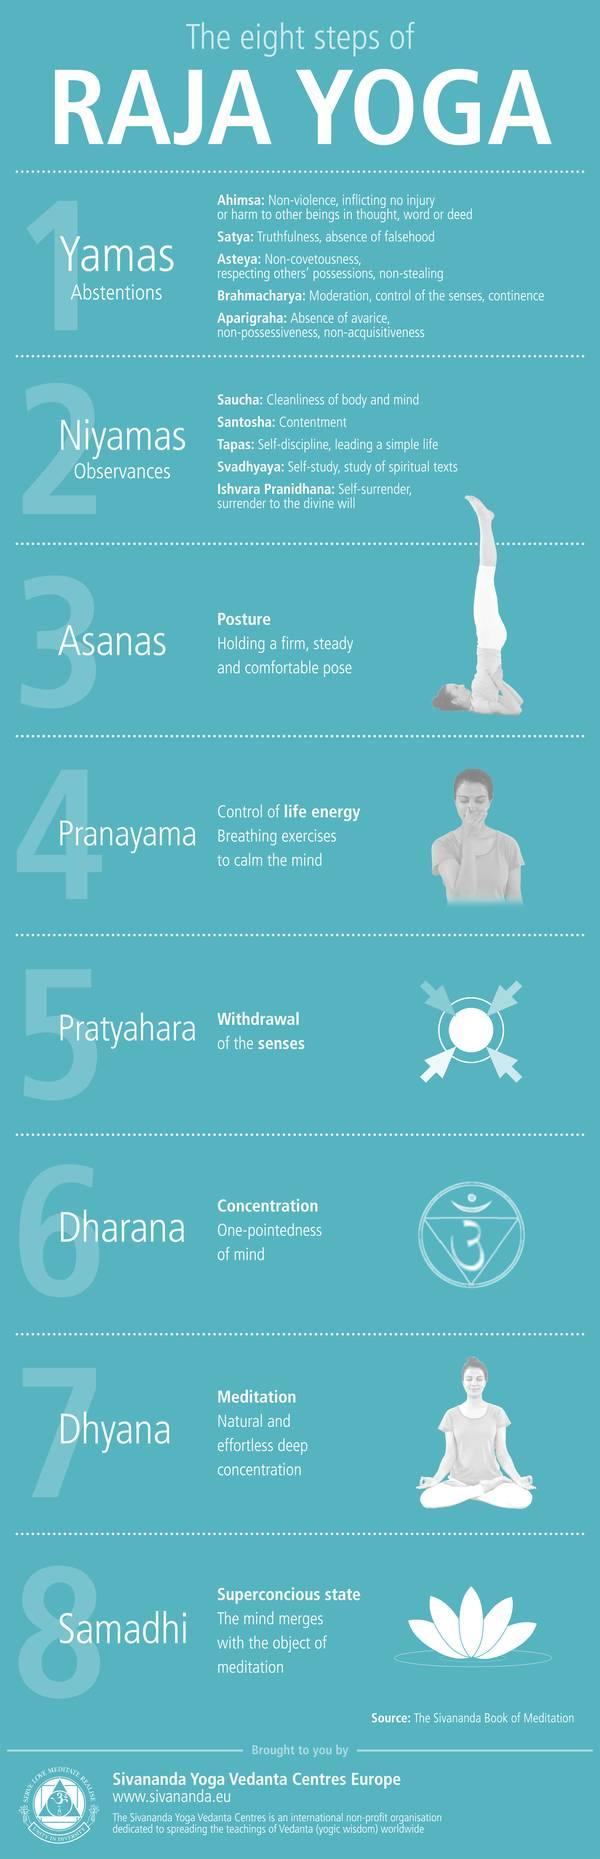 The eight steps of Raja Yoga